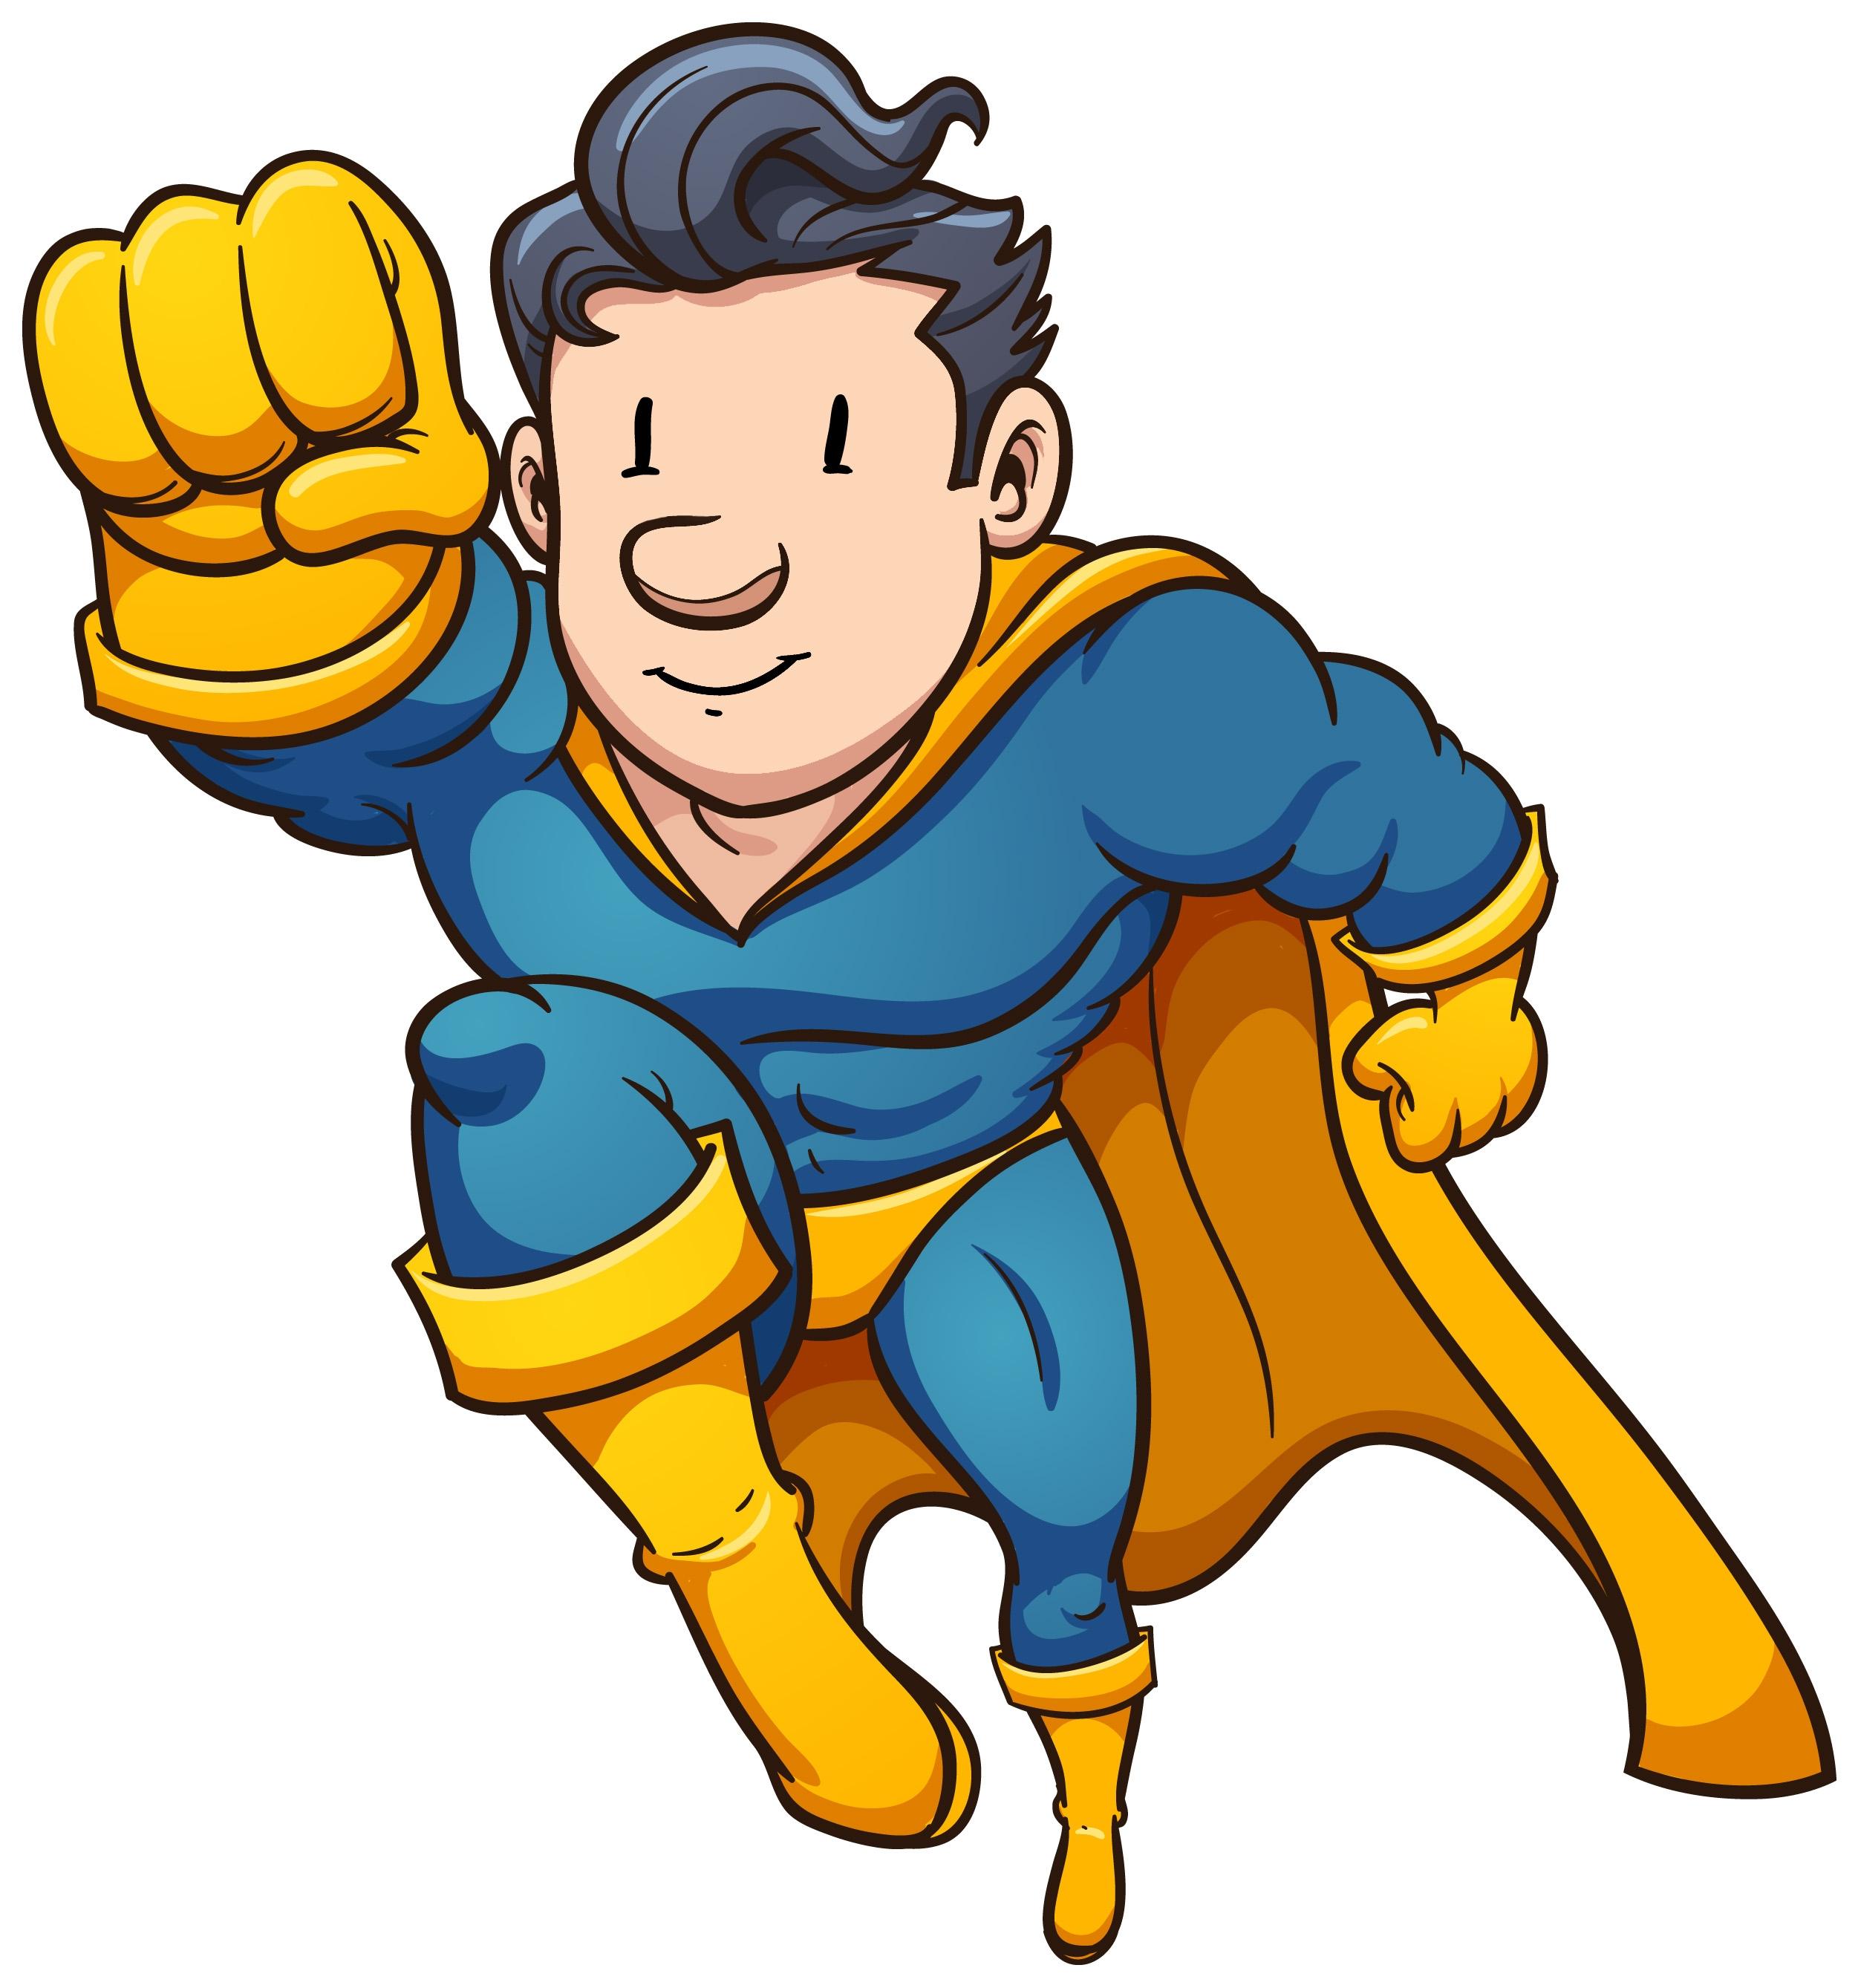 Free Superhero Clip Art Border-Free Superhero Clip Art Border-8